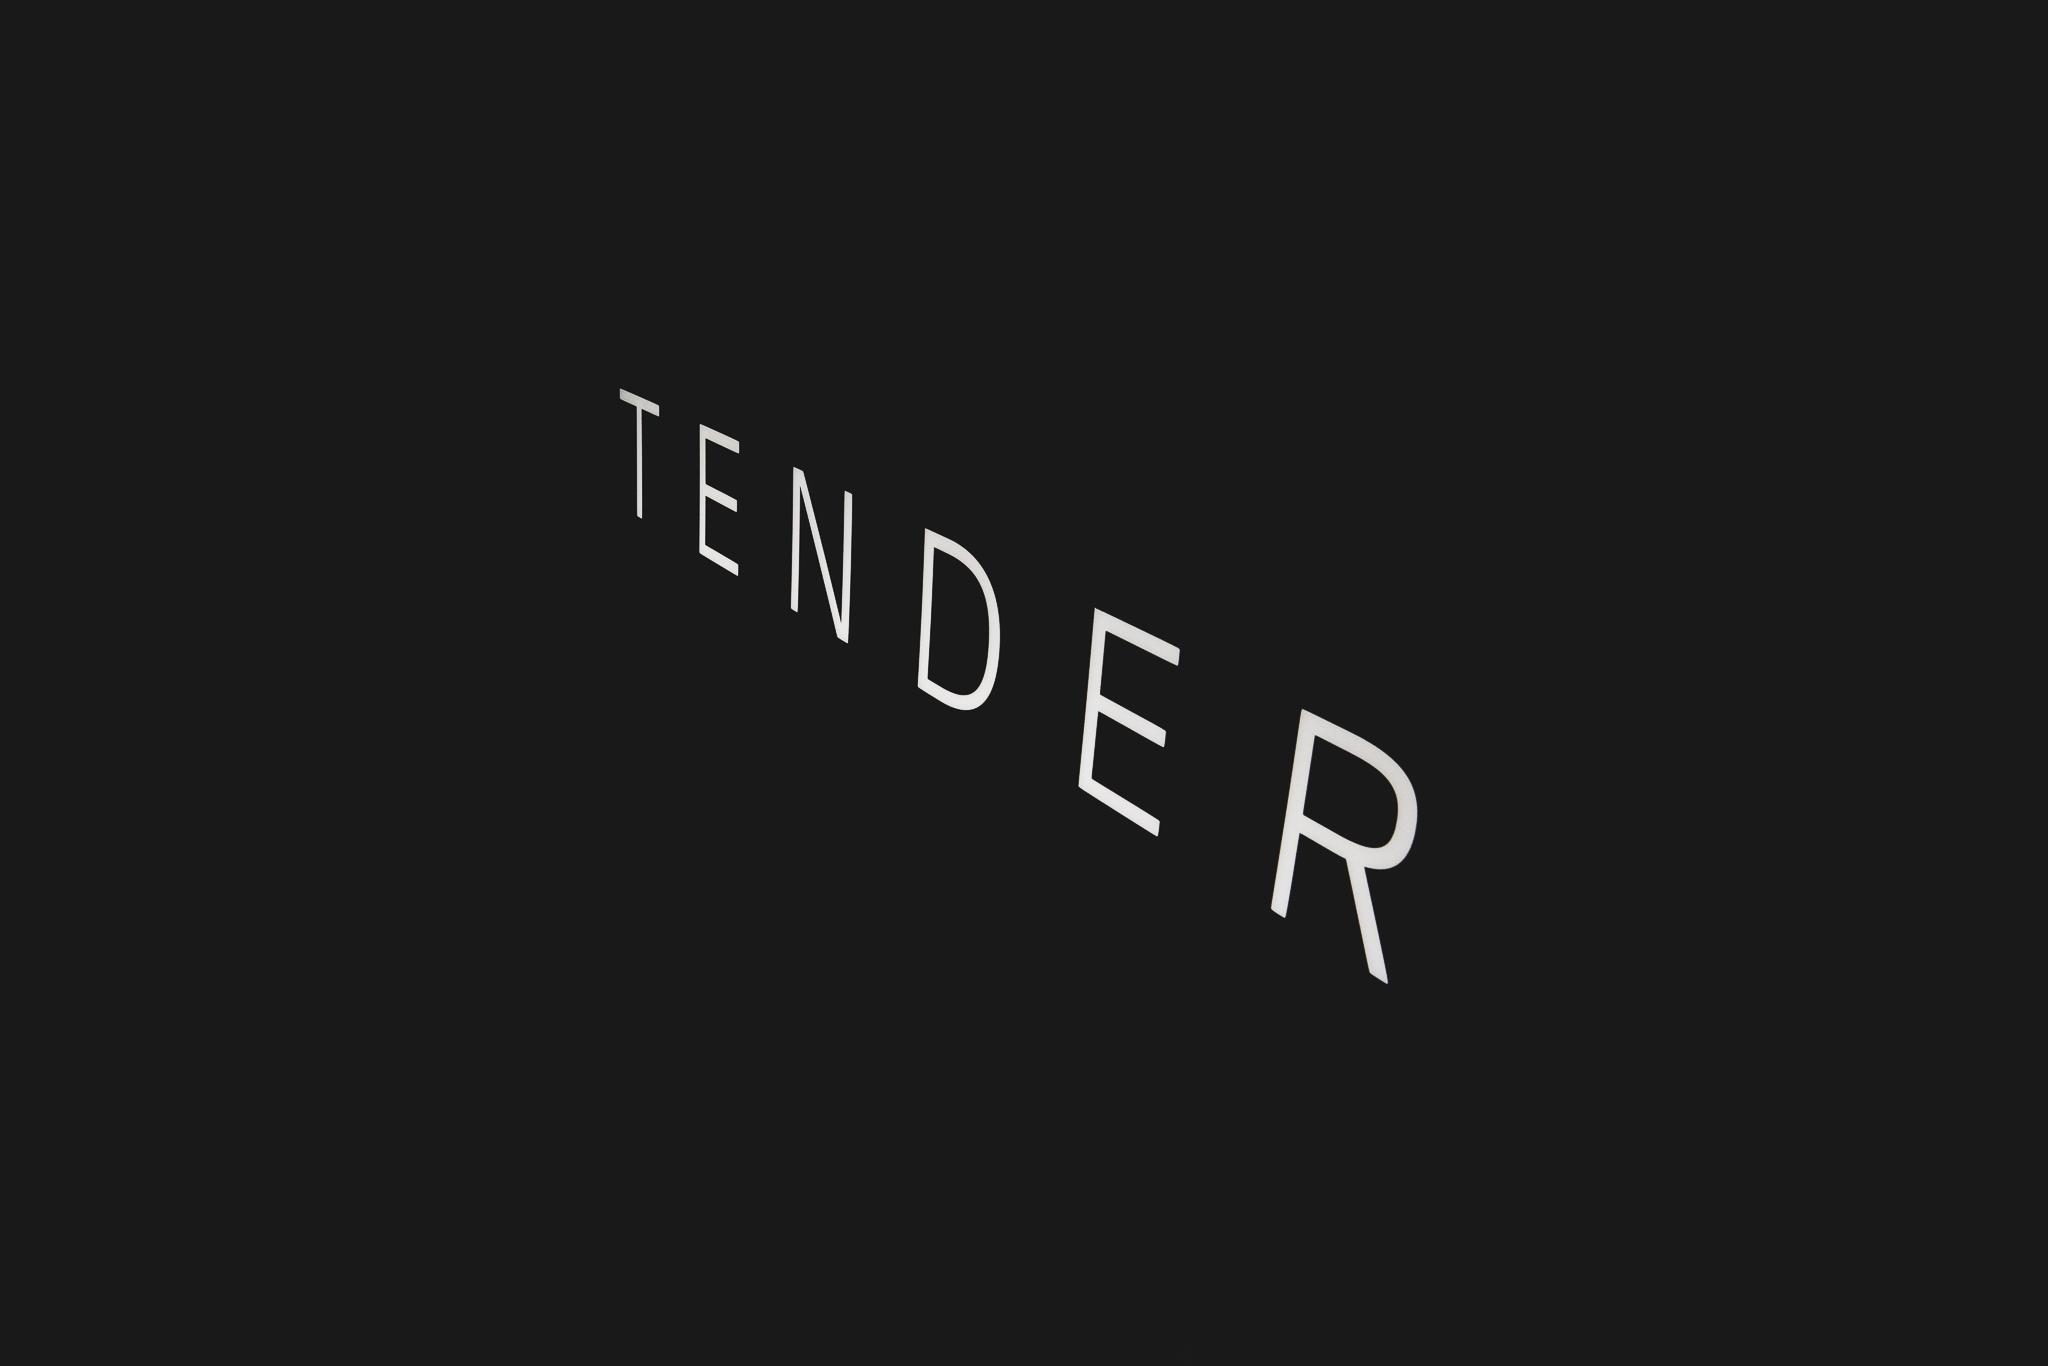 TENDER-26.jpg